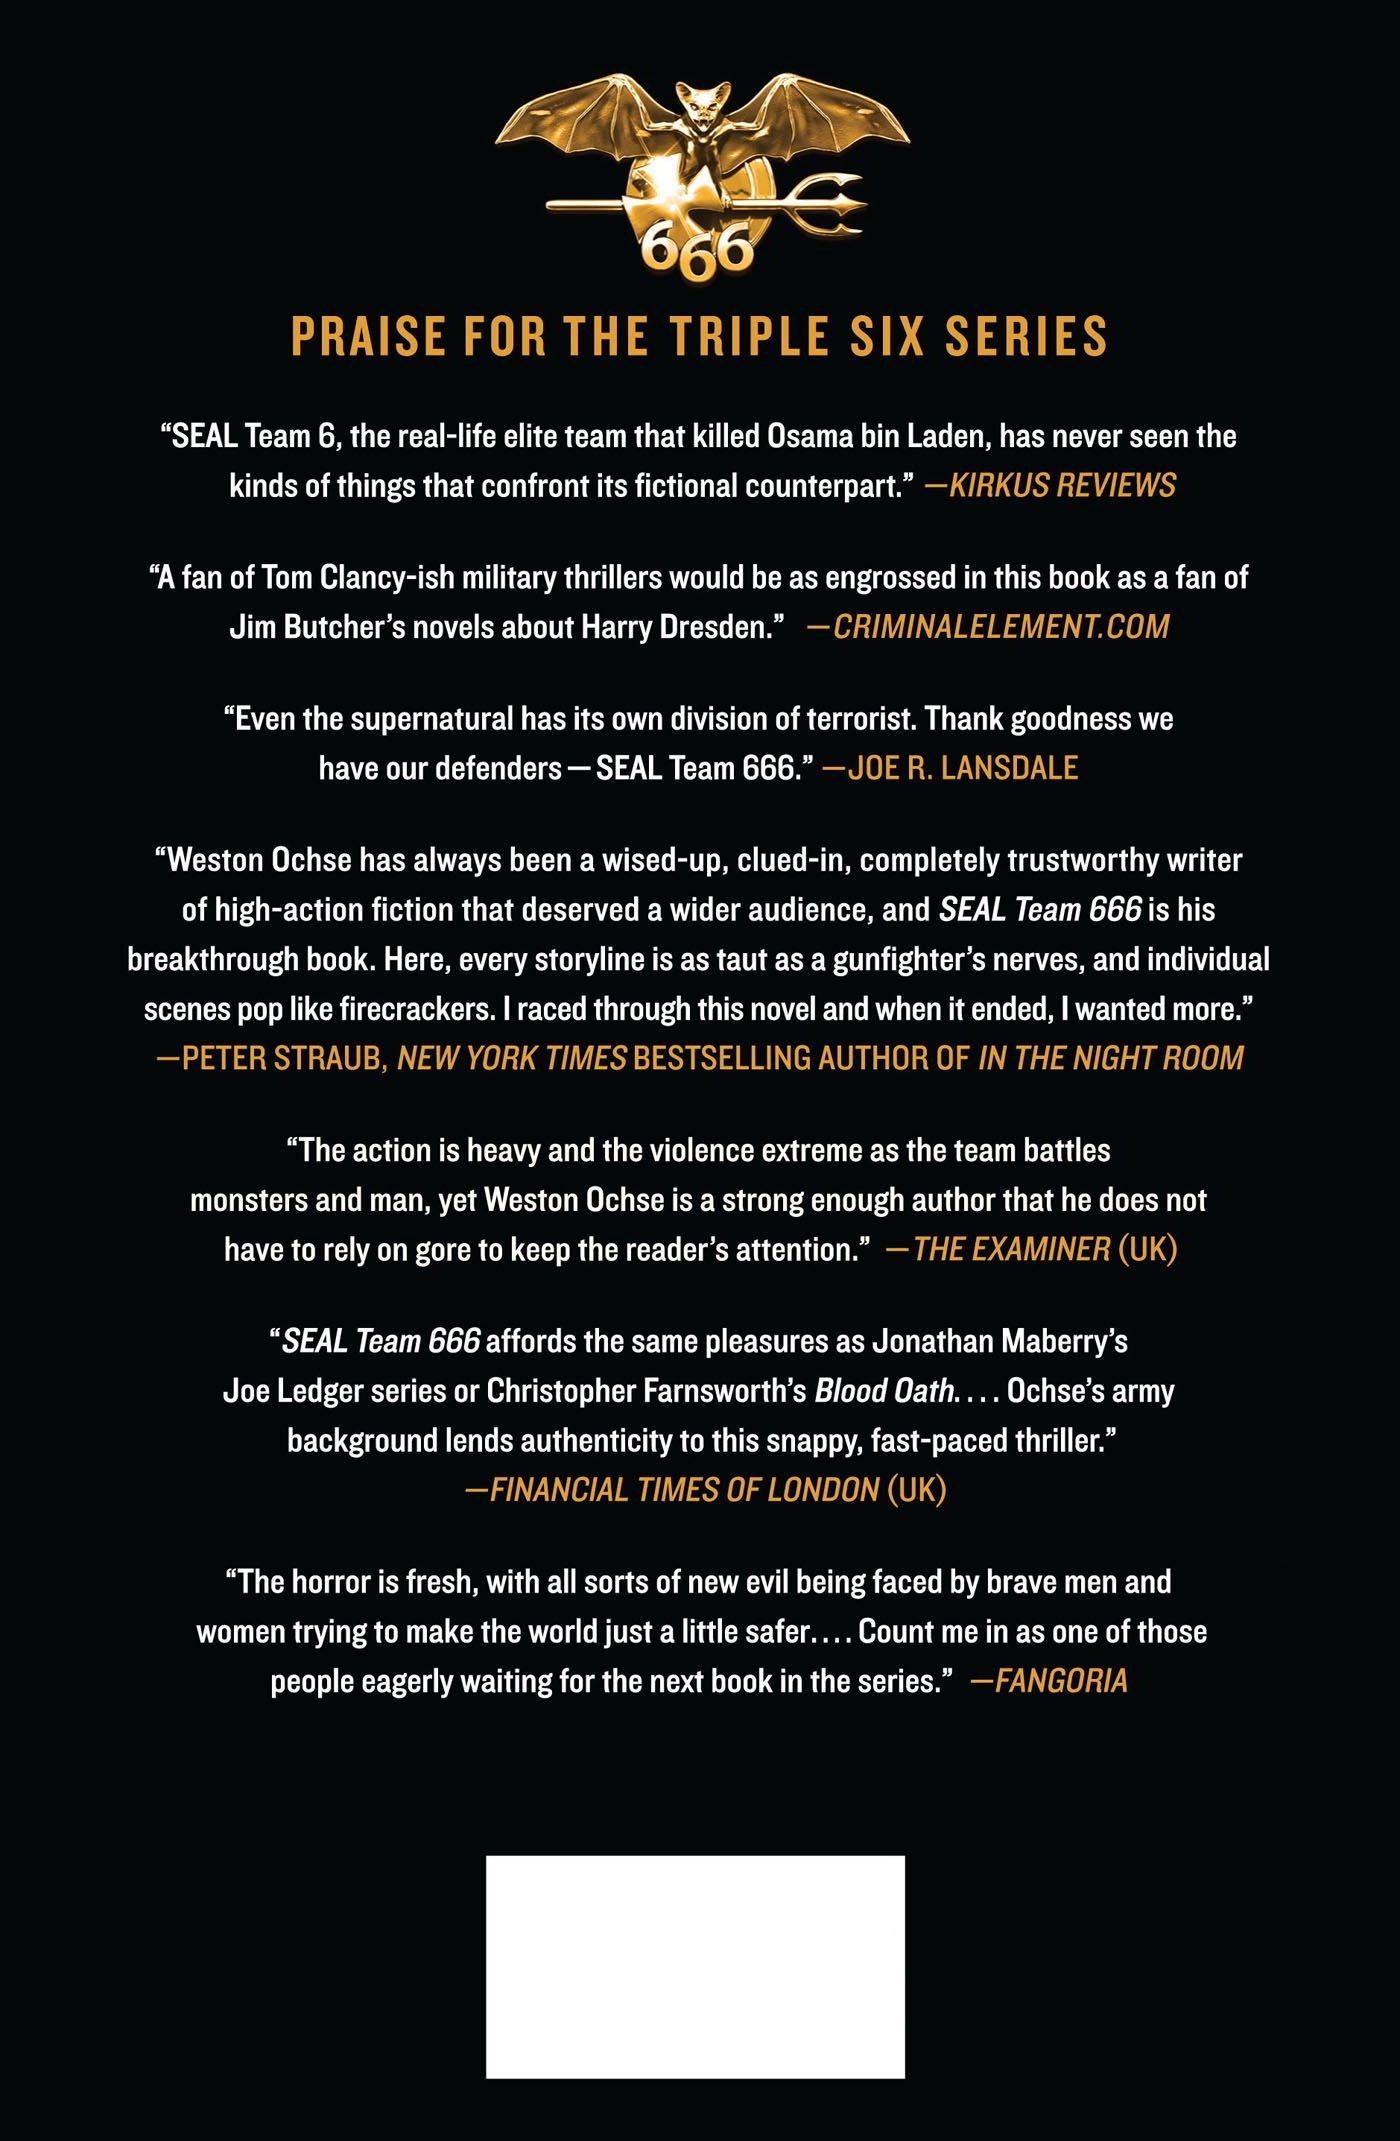 Amazon.com: Reign of Evil: A SEAL Team 666 Novel (9781250056009): Weston  Ochse: Books